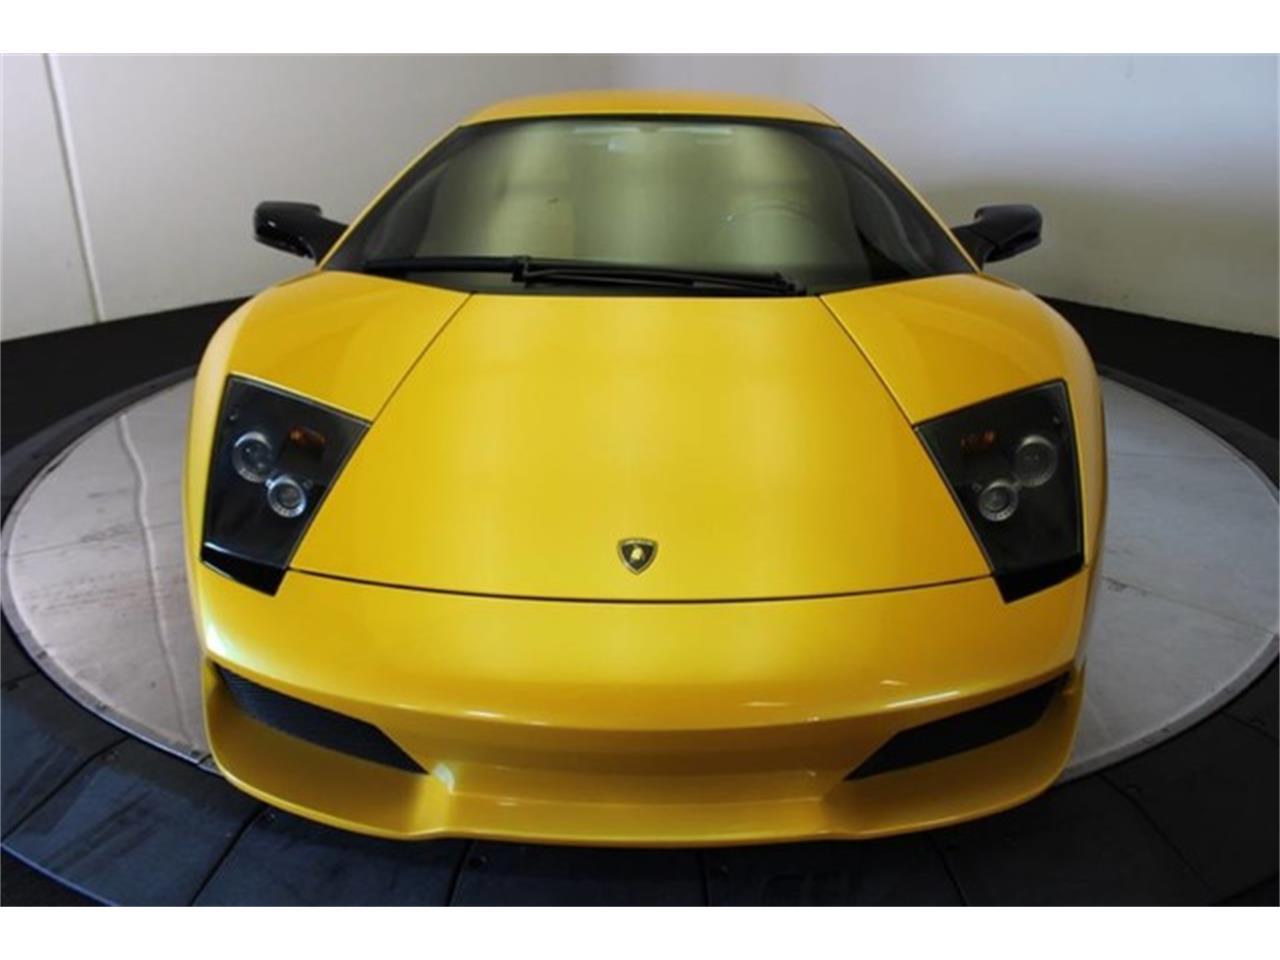 Large Picture of '07 Murcielago located in Anaheim California - $165,900.00 - L7IL